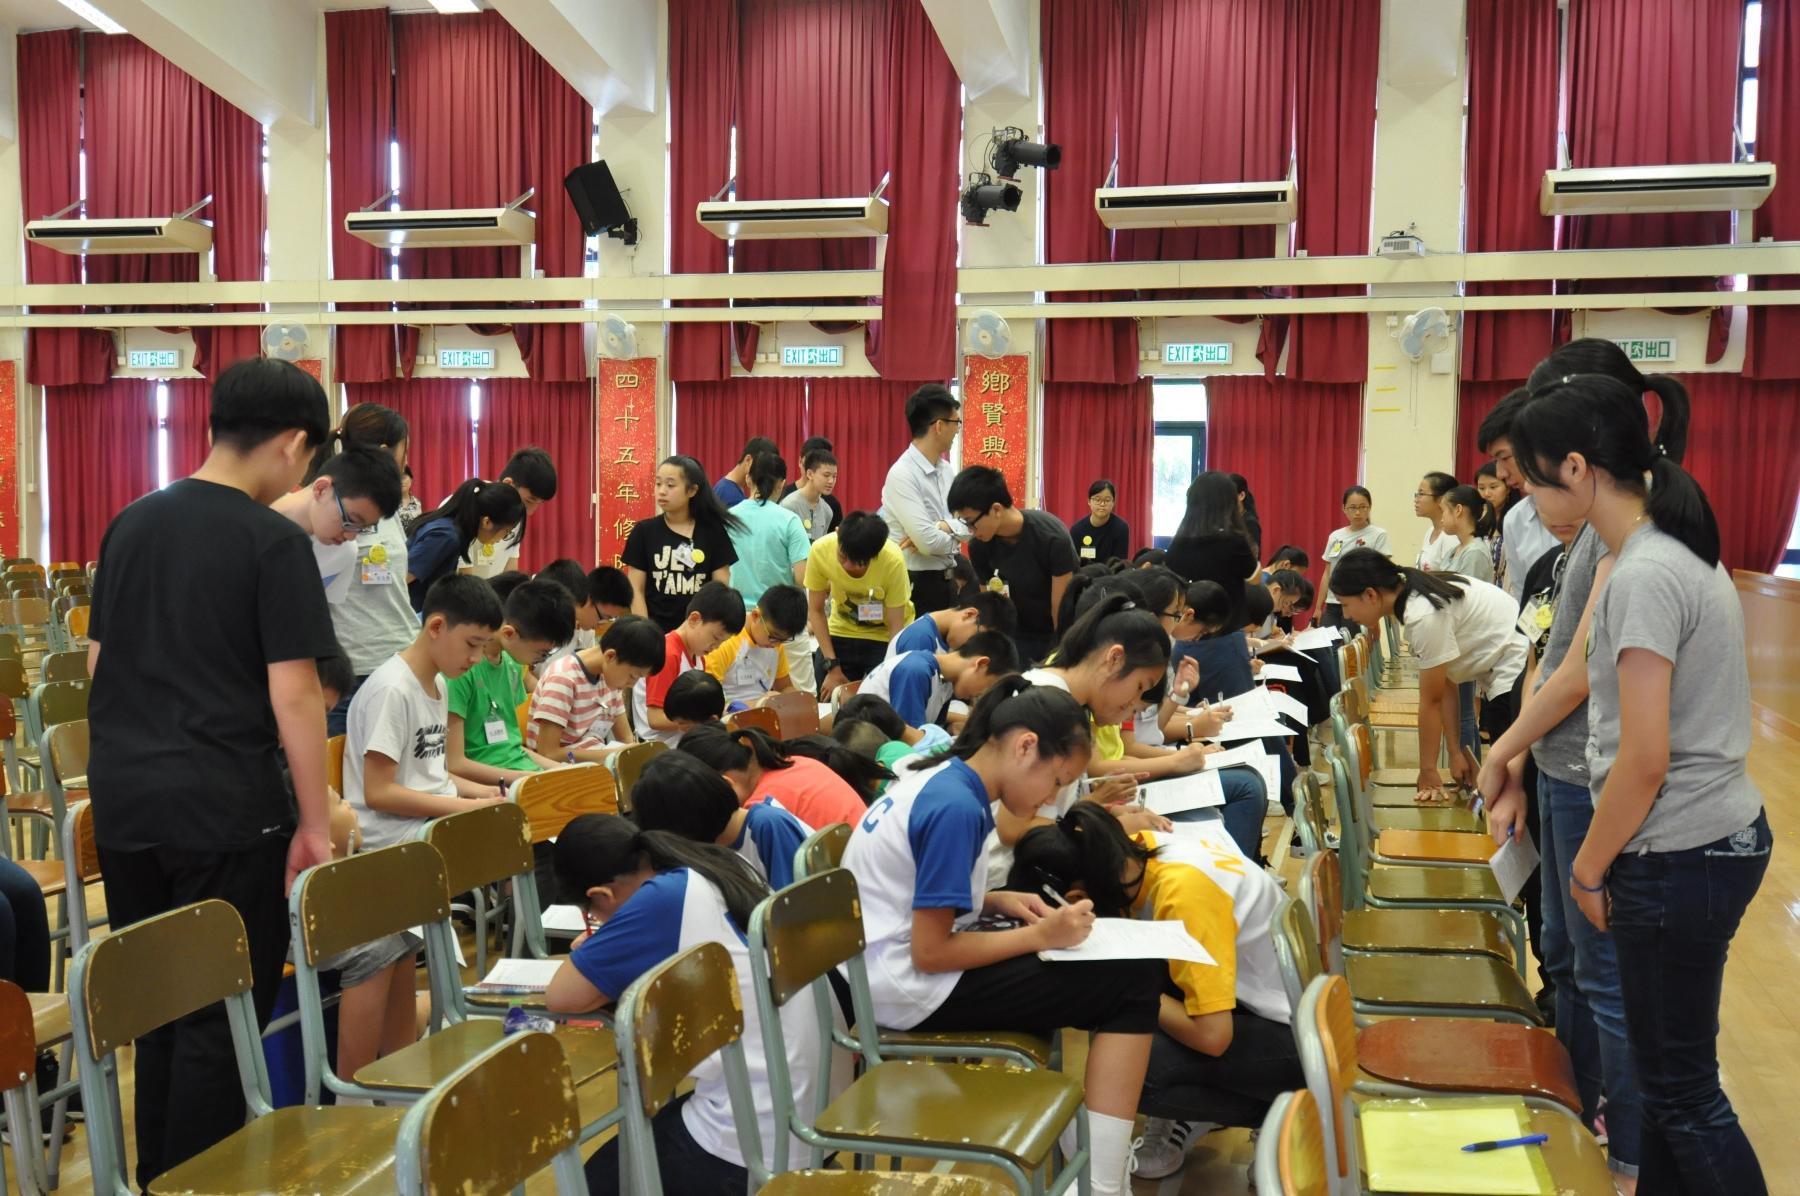 http://www.npc.edu.hk/sites/default/files/dsc_0363.jpg